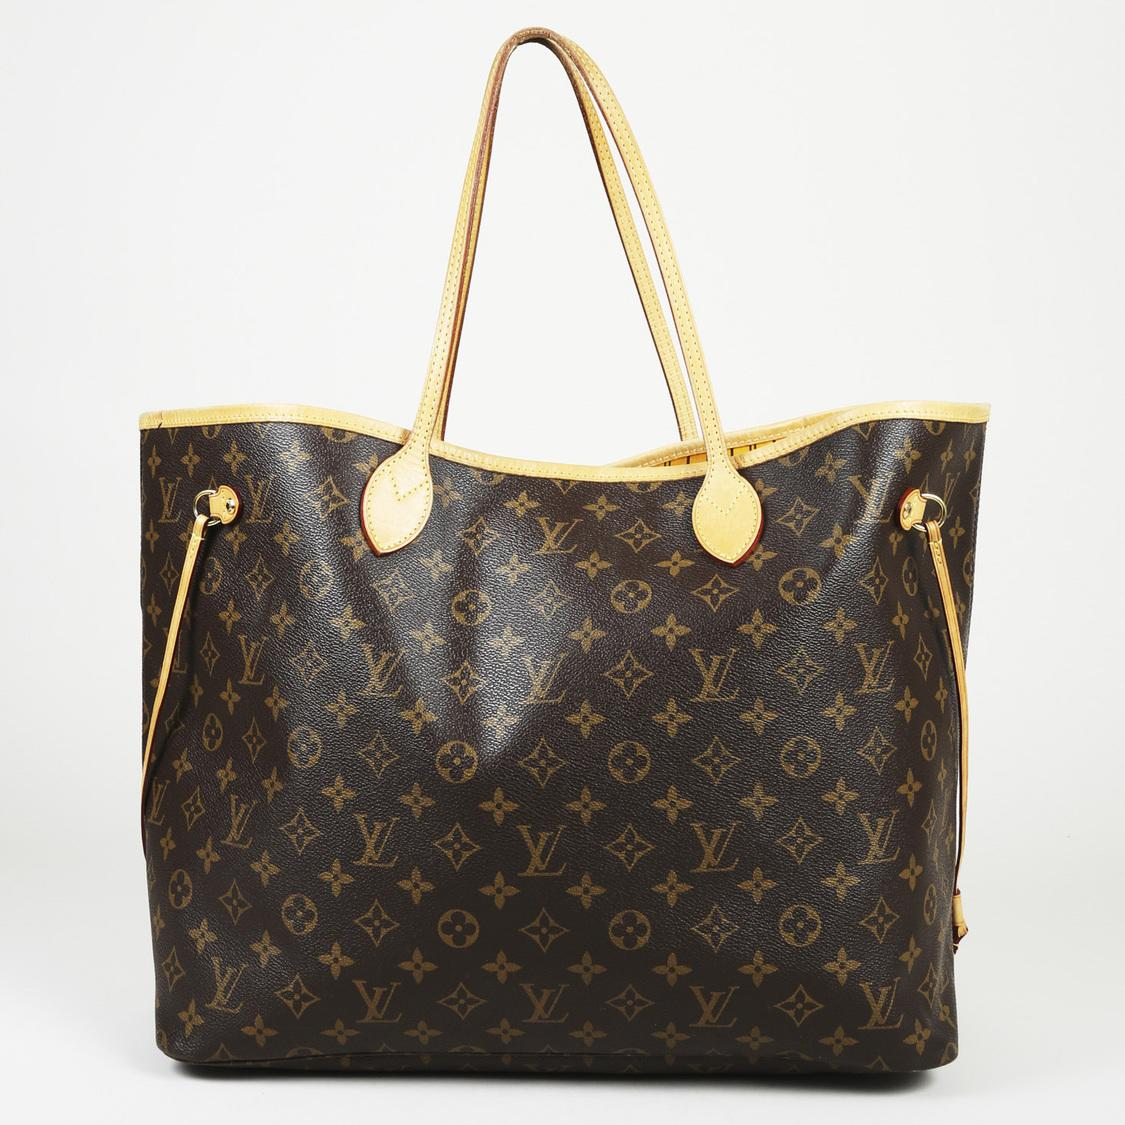 Louis Vuitton Neverfull Gm Monogram Tote Bag in Brown - Lyst